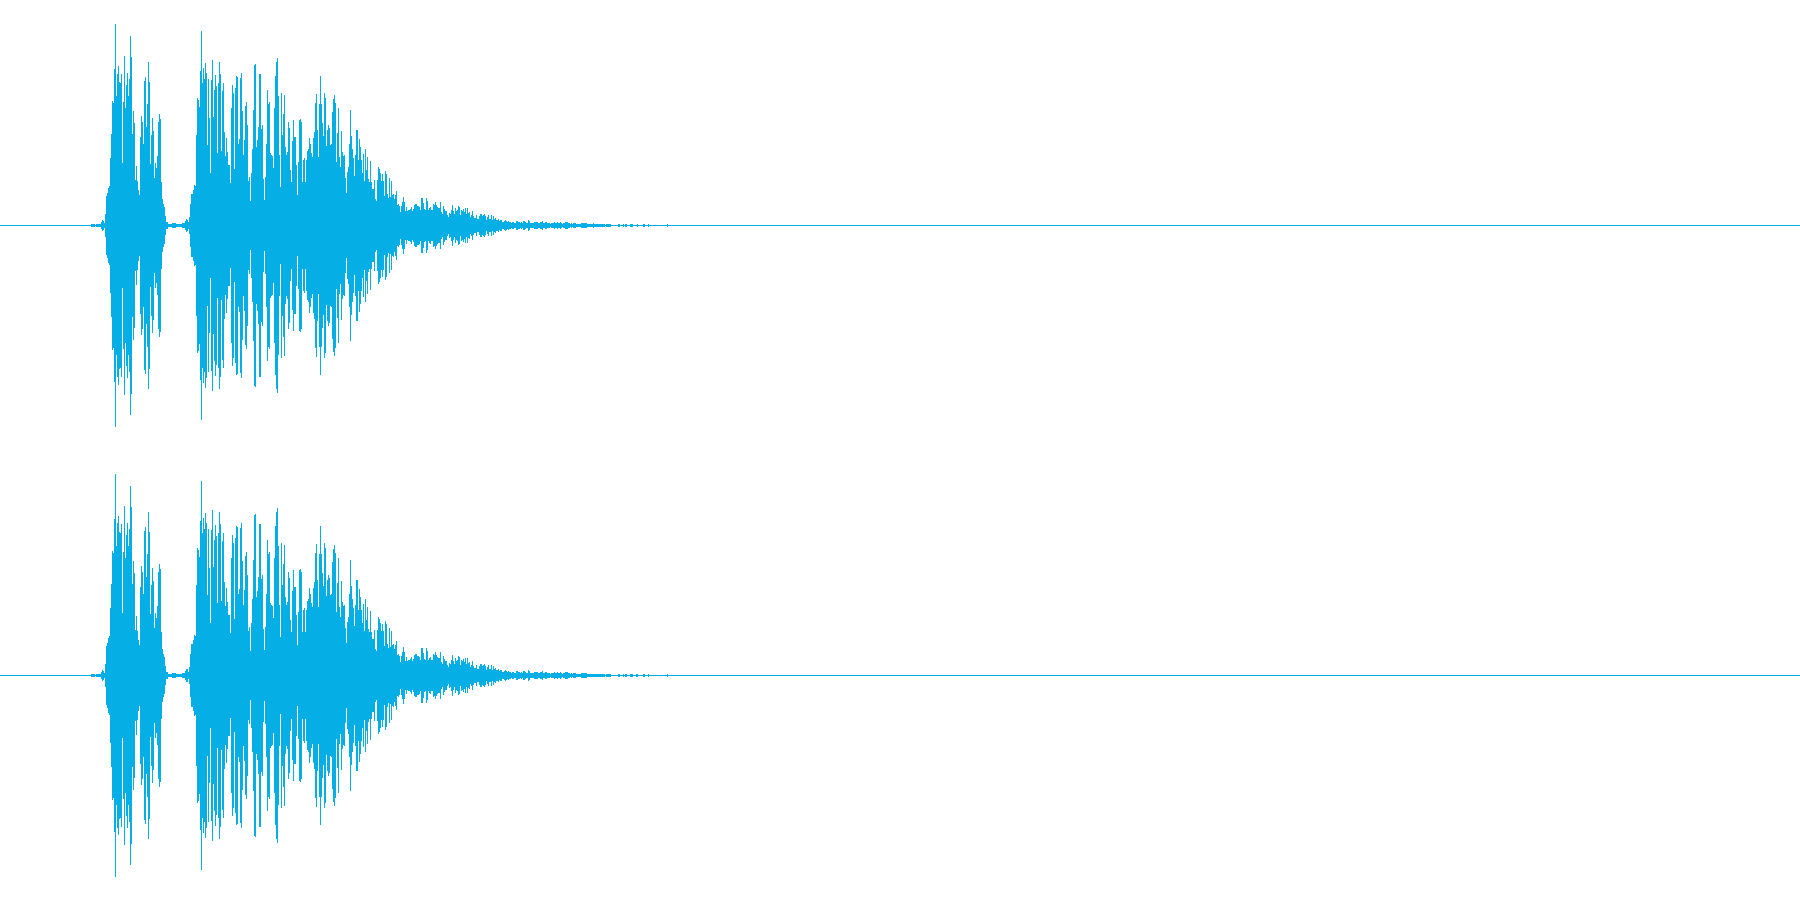 SNES 格闘05-04(ヒット)の再生済みの波形